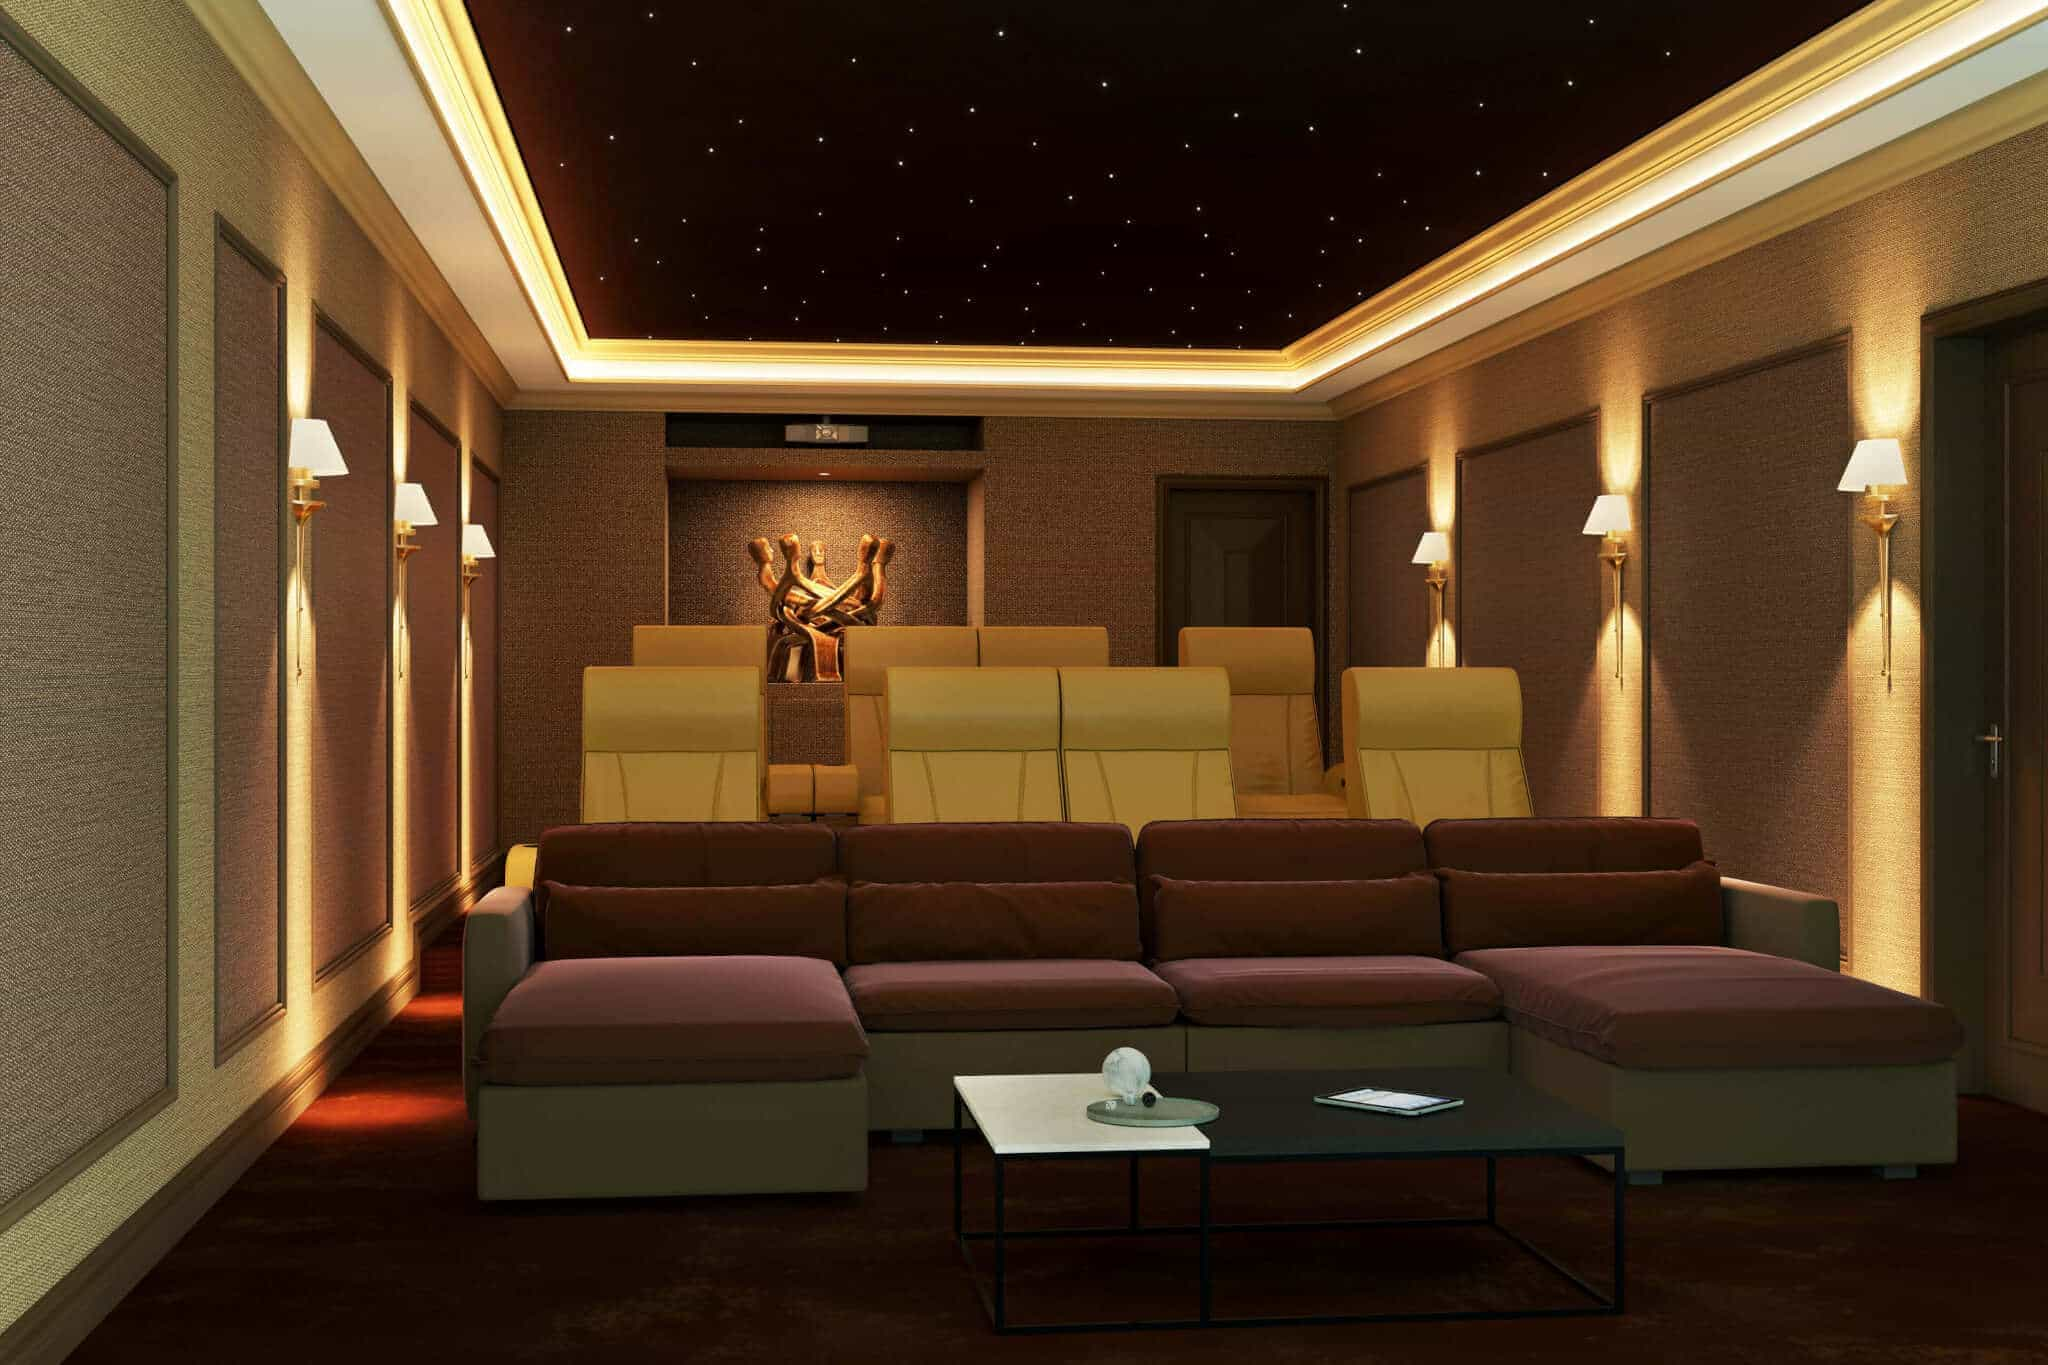 Home Cinema Room Design